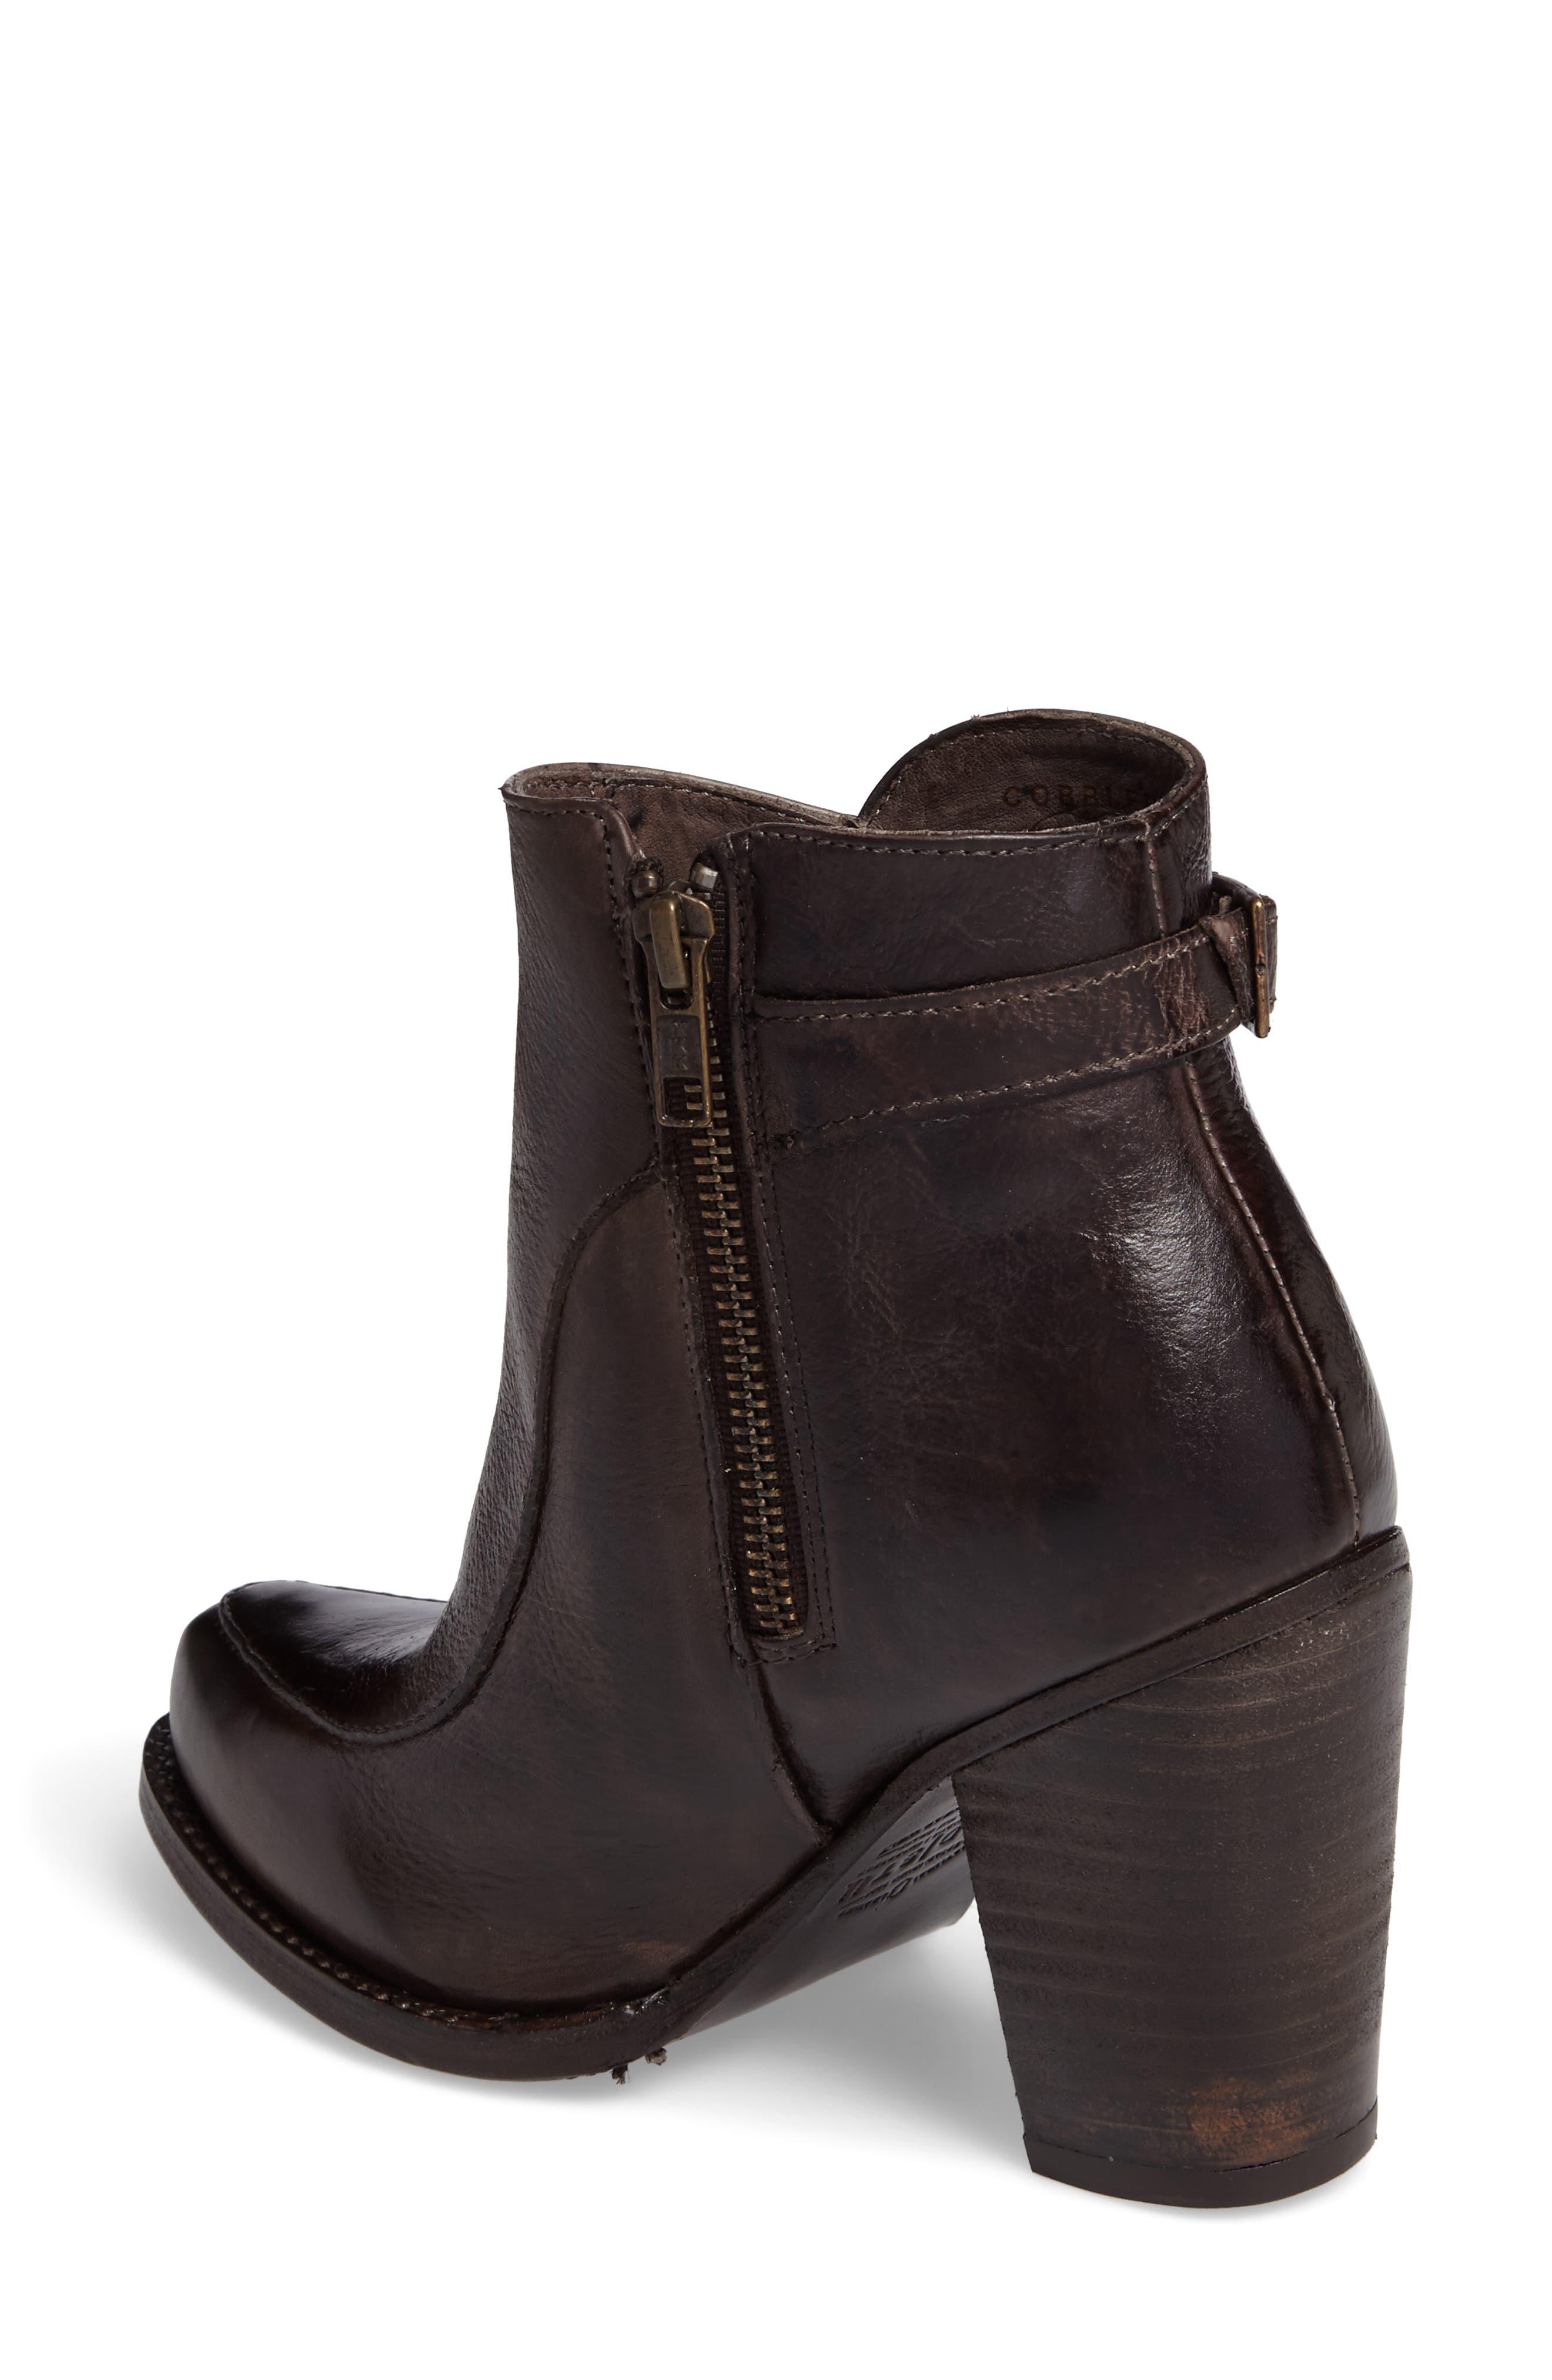 Alternate Image 2  - Bed Stu 'Isla' Stacked Heel Boot (Women)